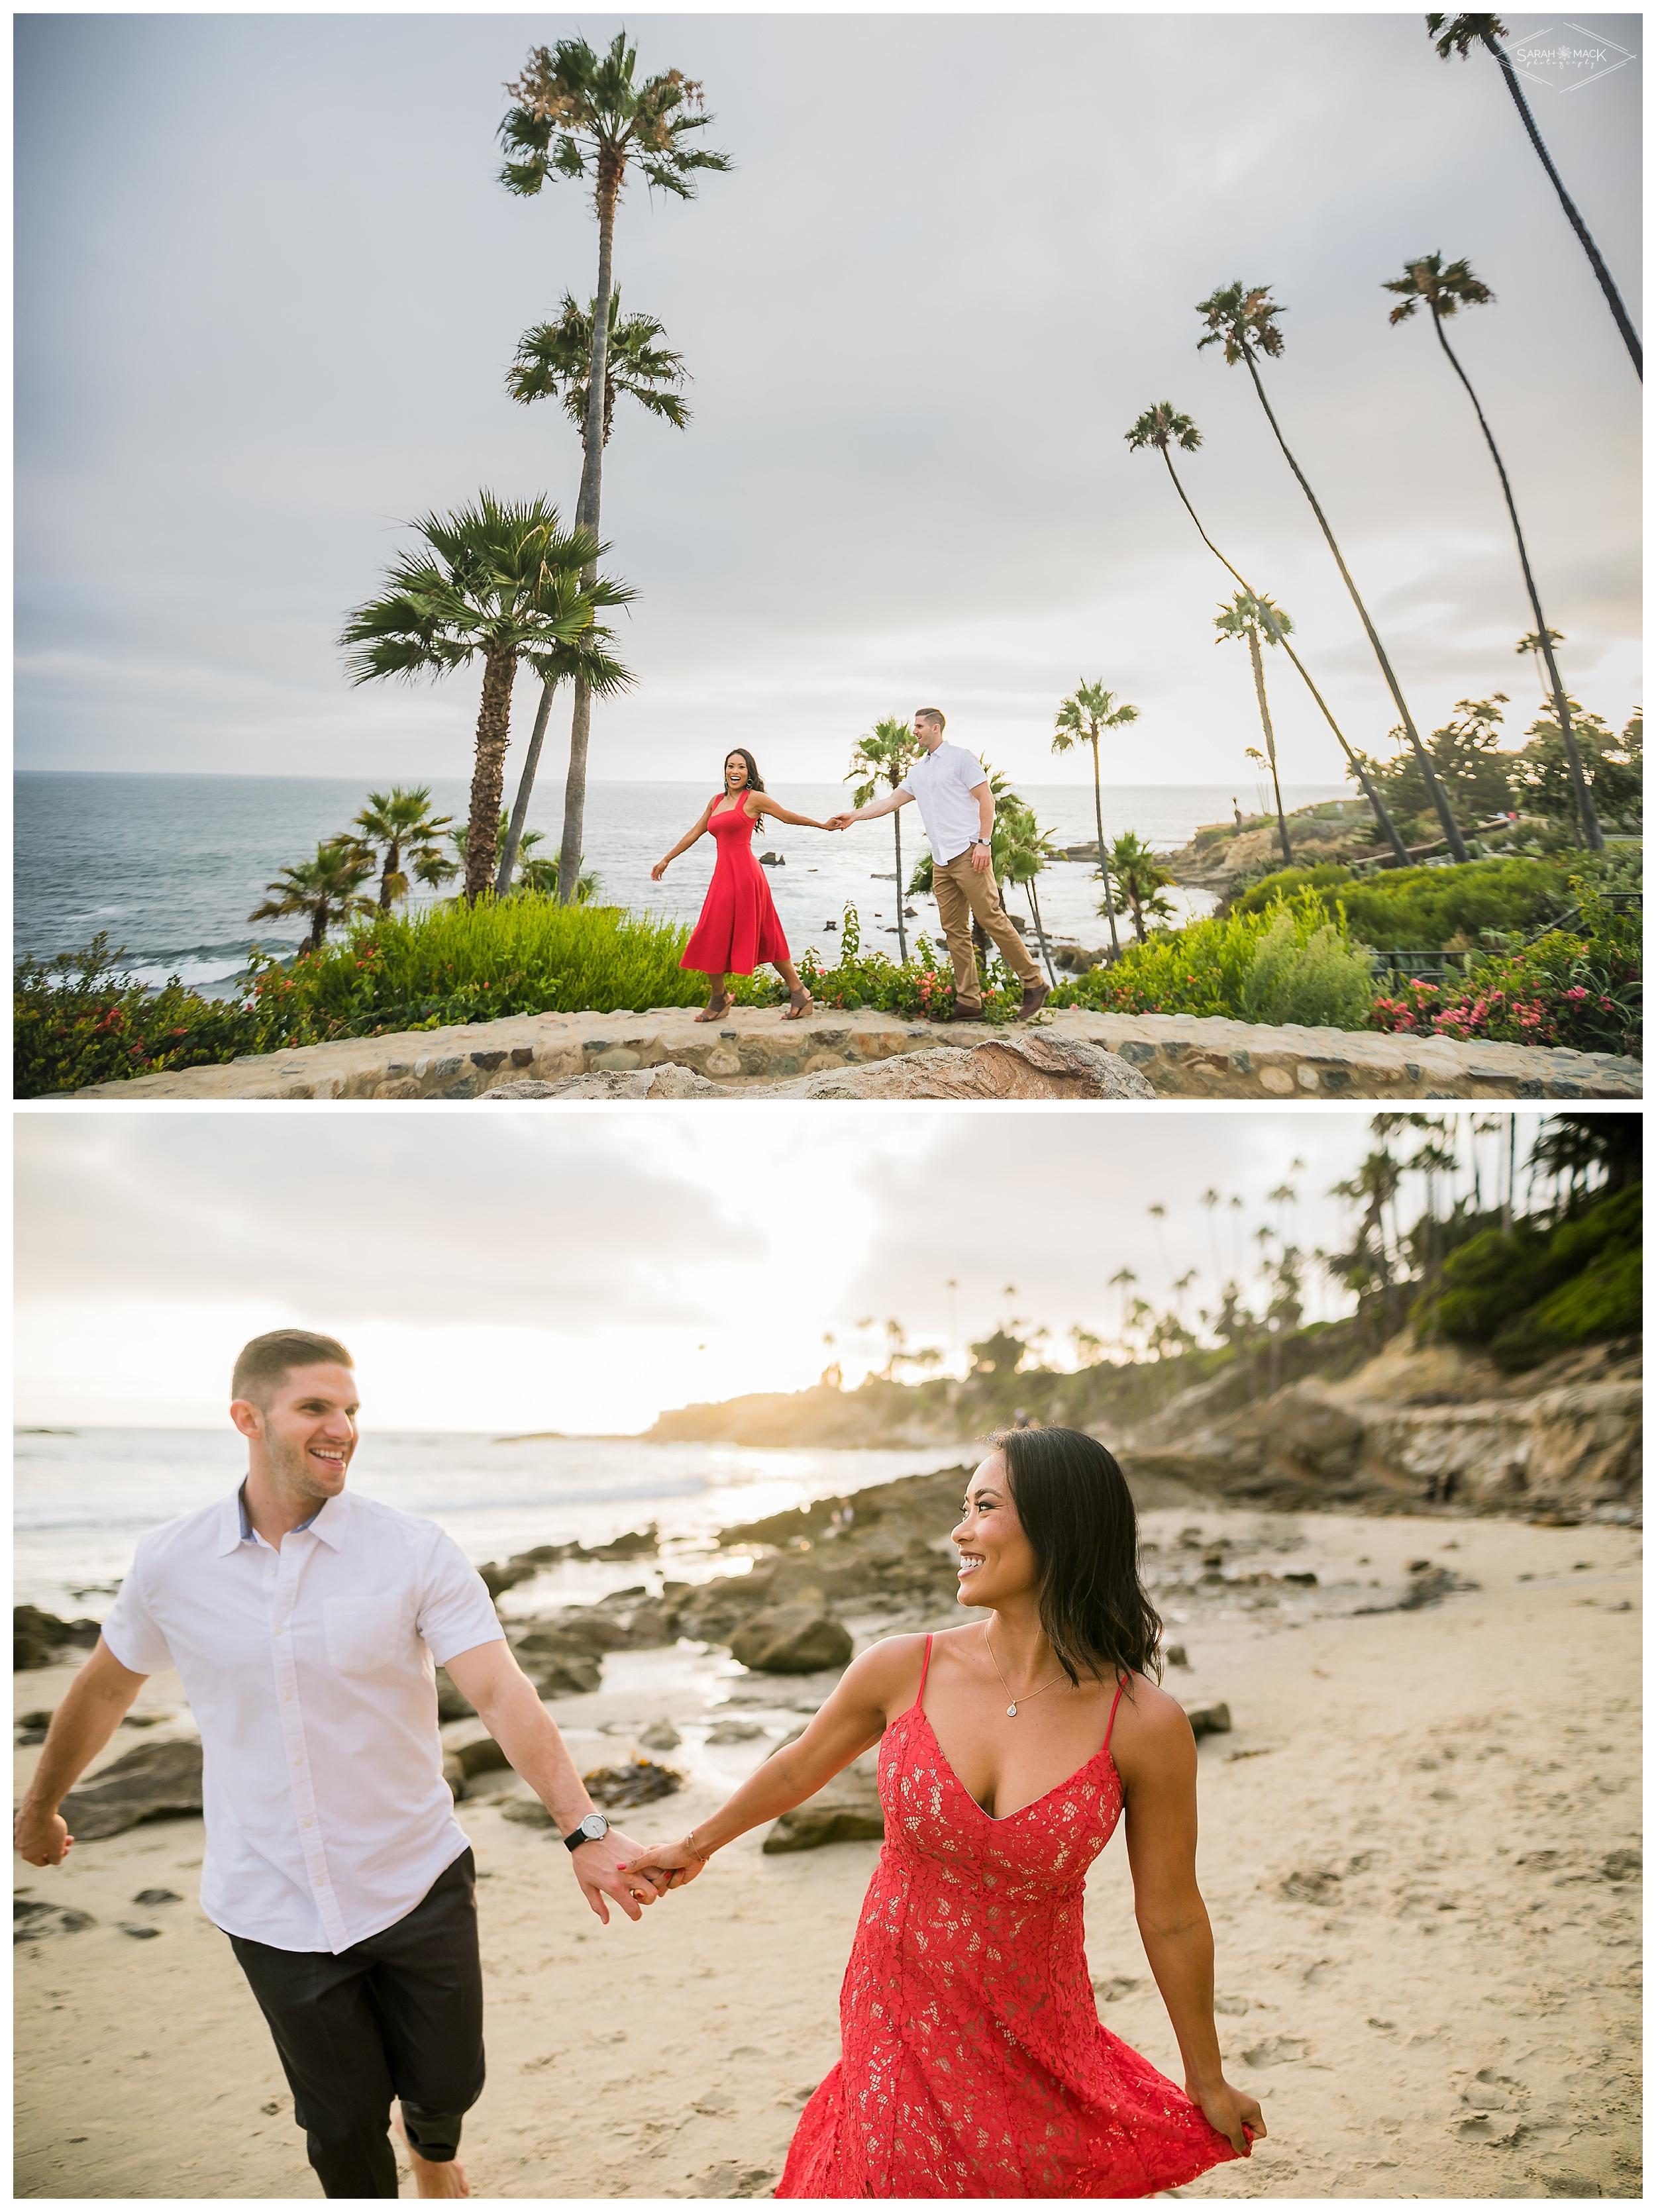 JA_Laguna-Beach-Engagement-Photography 62.jpg